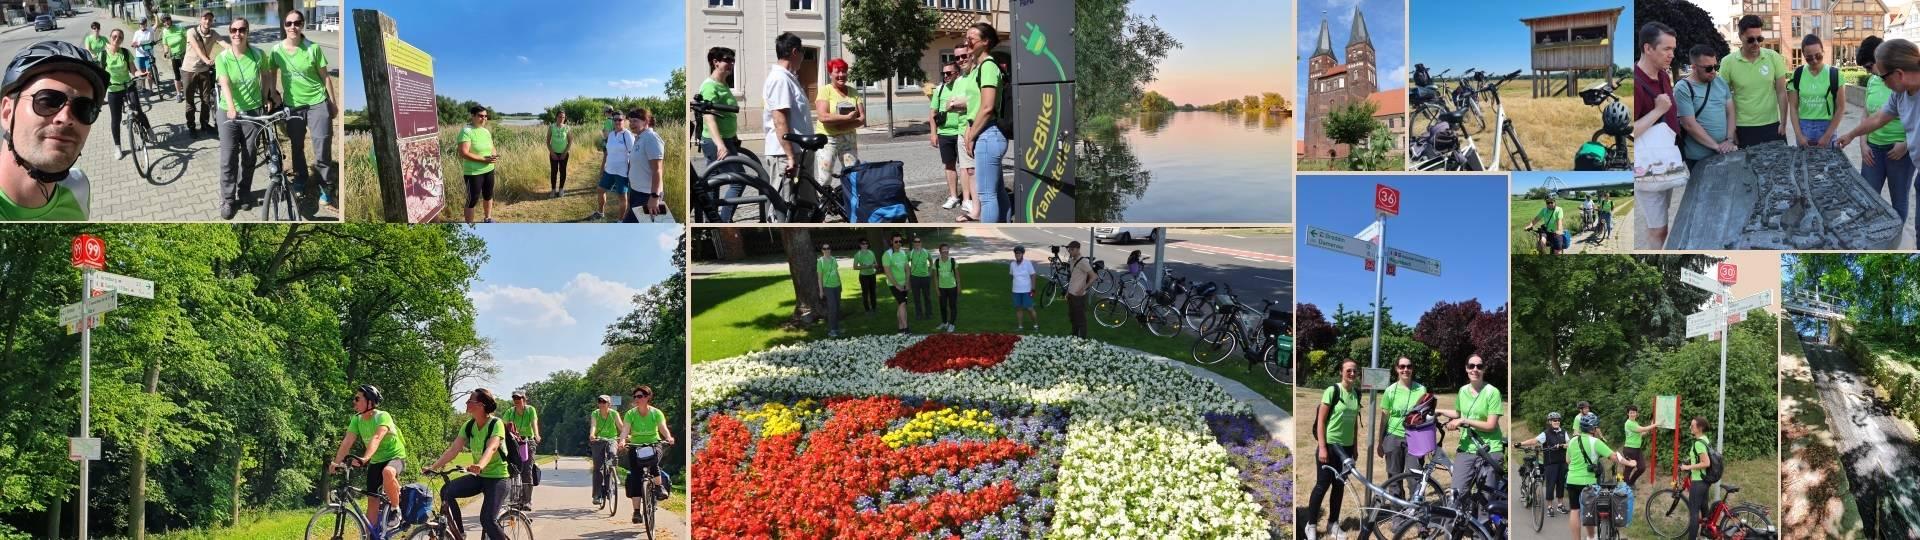 kopfgrafik pedalenspione unterwegs im elb havel winkel 2021 ©Hansestadt Havelberg